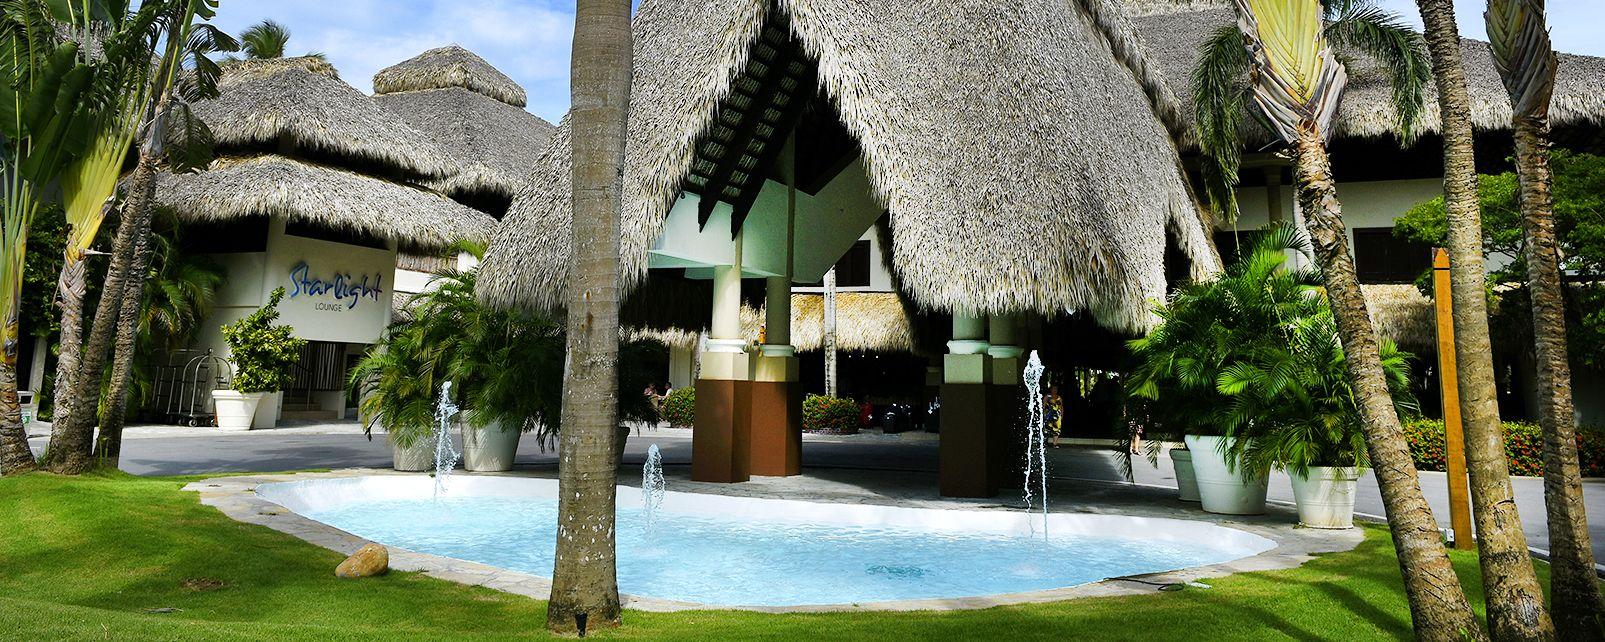 H 244 Tel Sunscape Bavaro Beach Punta Cana Punta Cana R 233 Publique Dominicaine